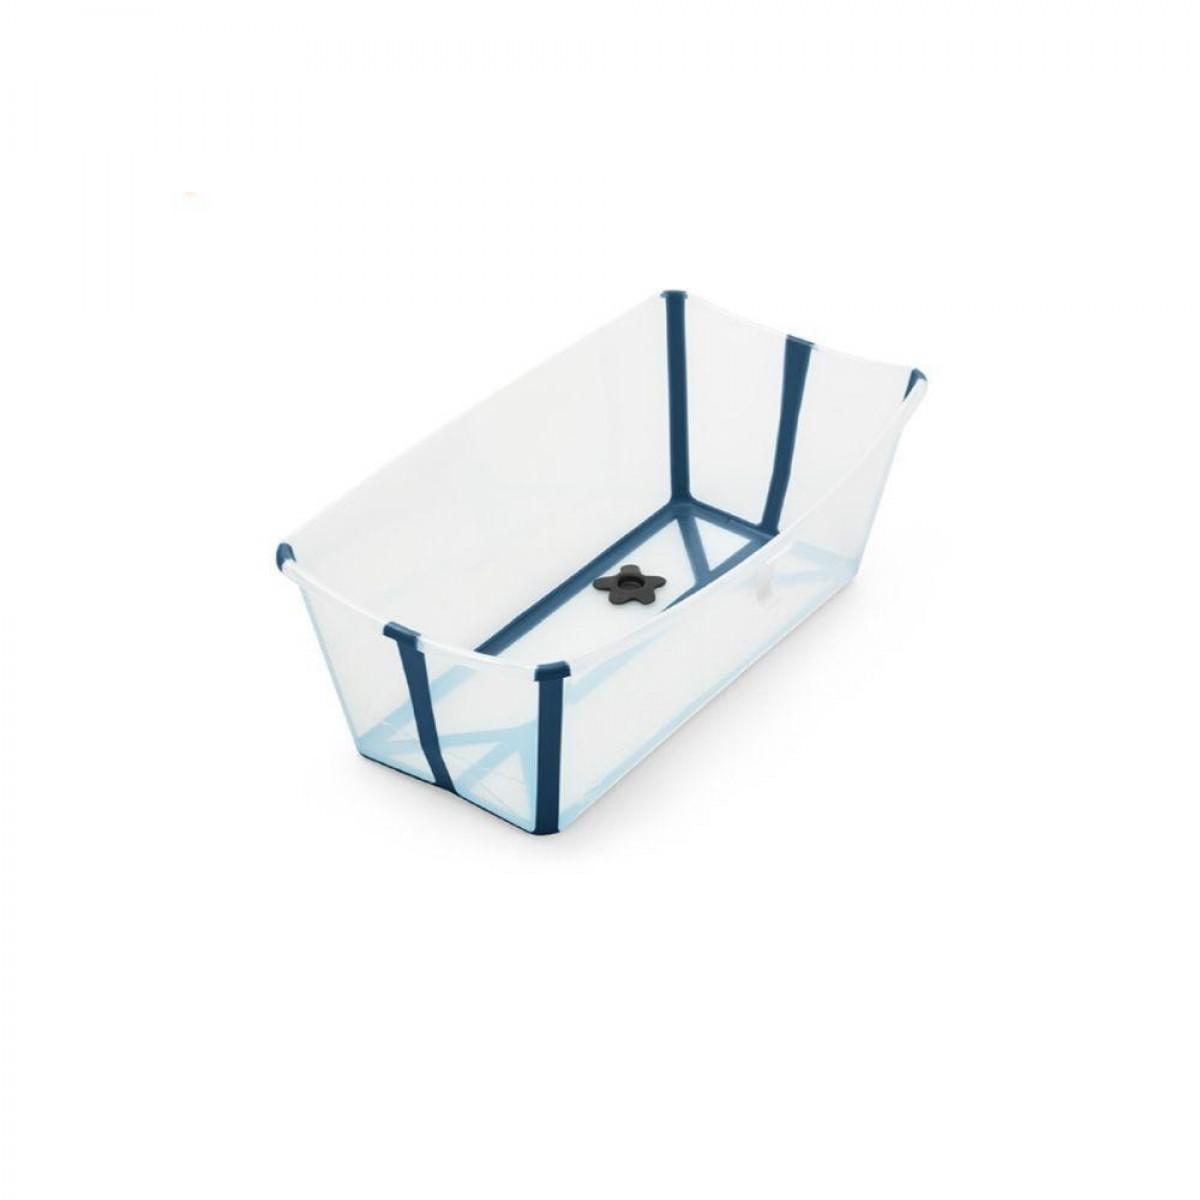 Stokke Flexi Bath - Transparent Blue